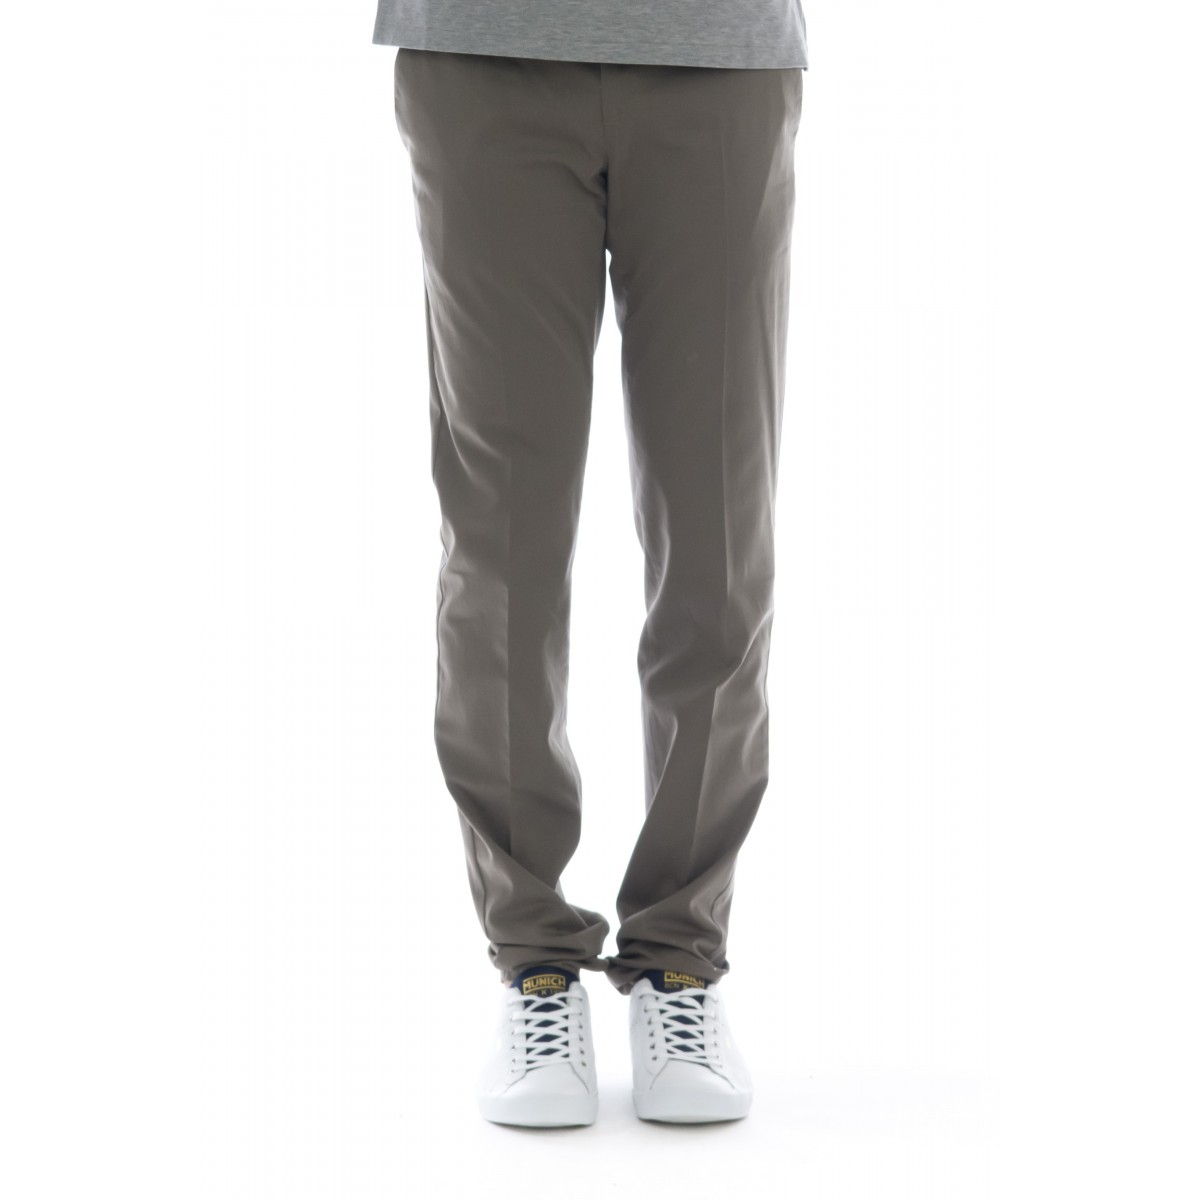 Pantalone uomo - Codl01z00rft bb14 cotone seta strech super slim